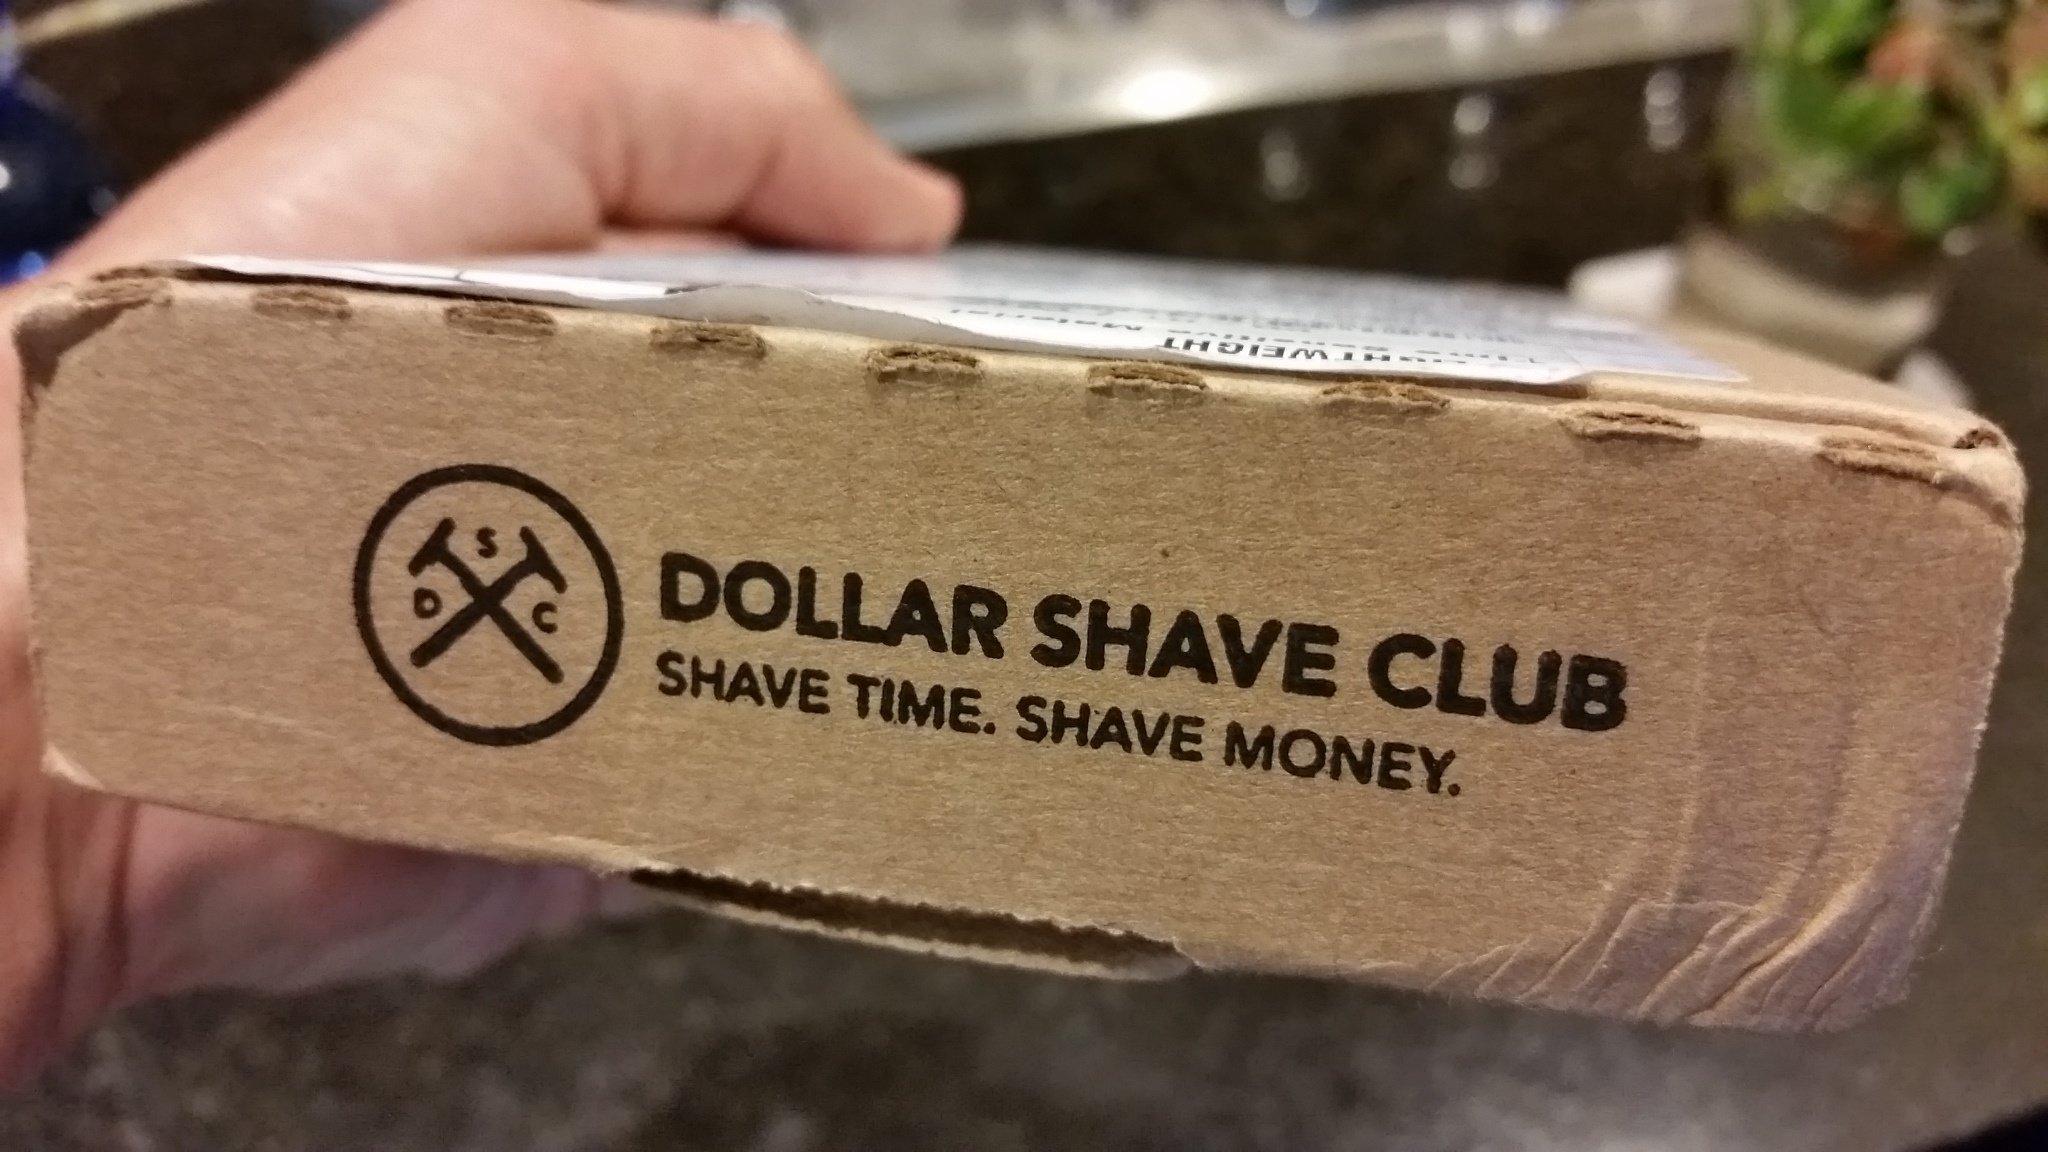 Dollar-Shave-Club-Slogan.jpg